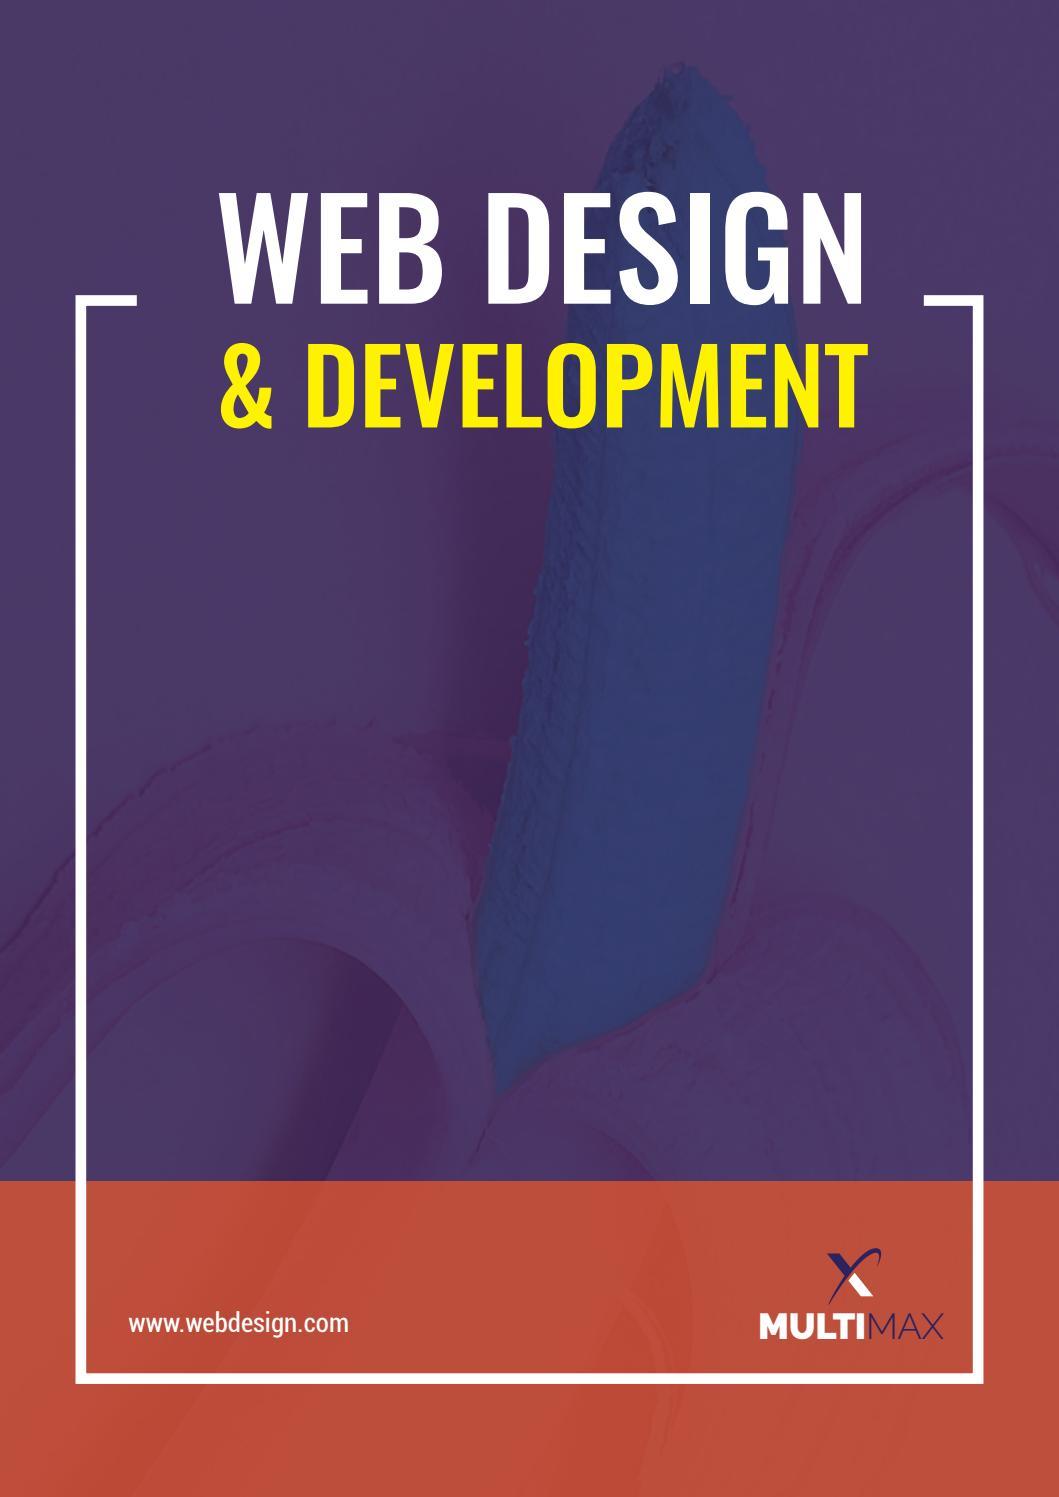 Web design & development Company Brochure by Al-Mamun - issuu